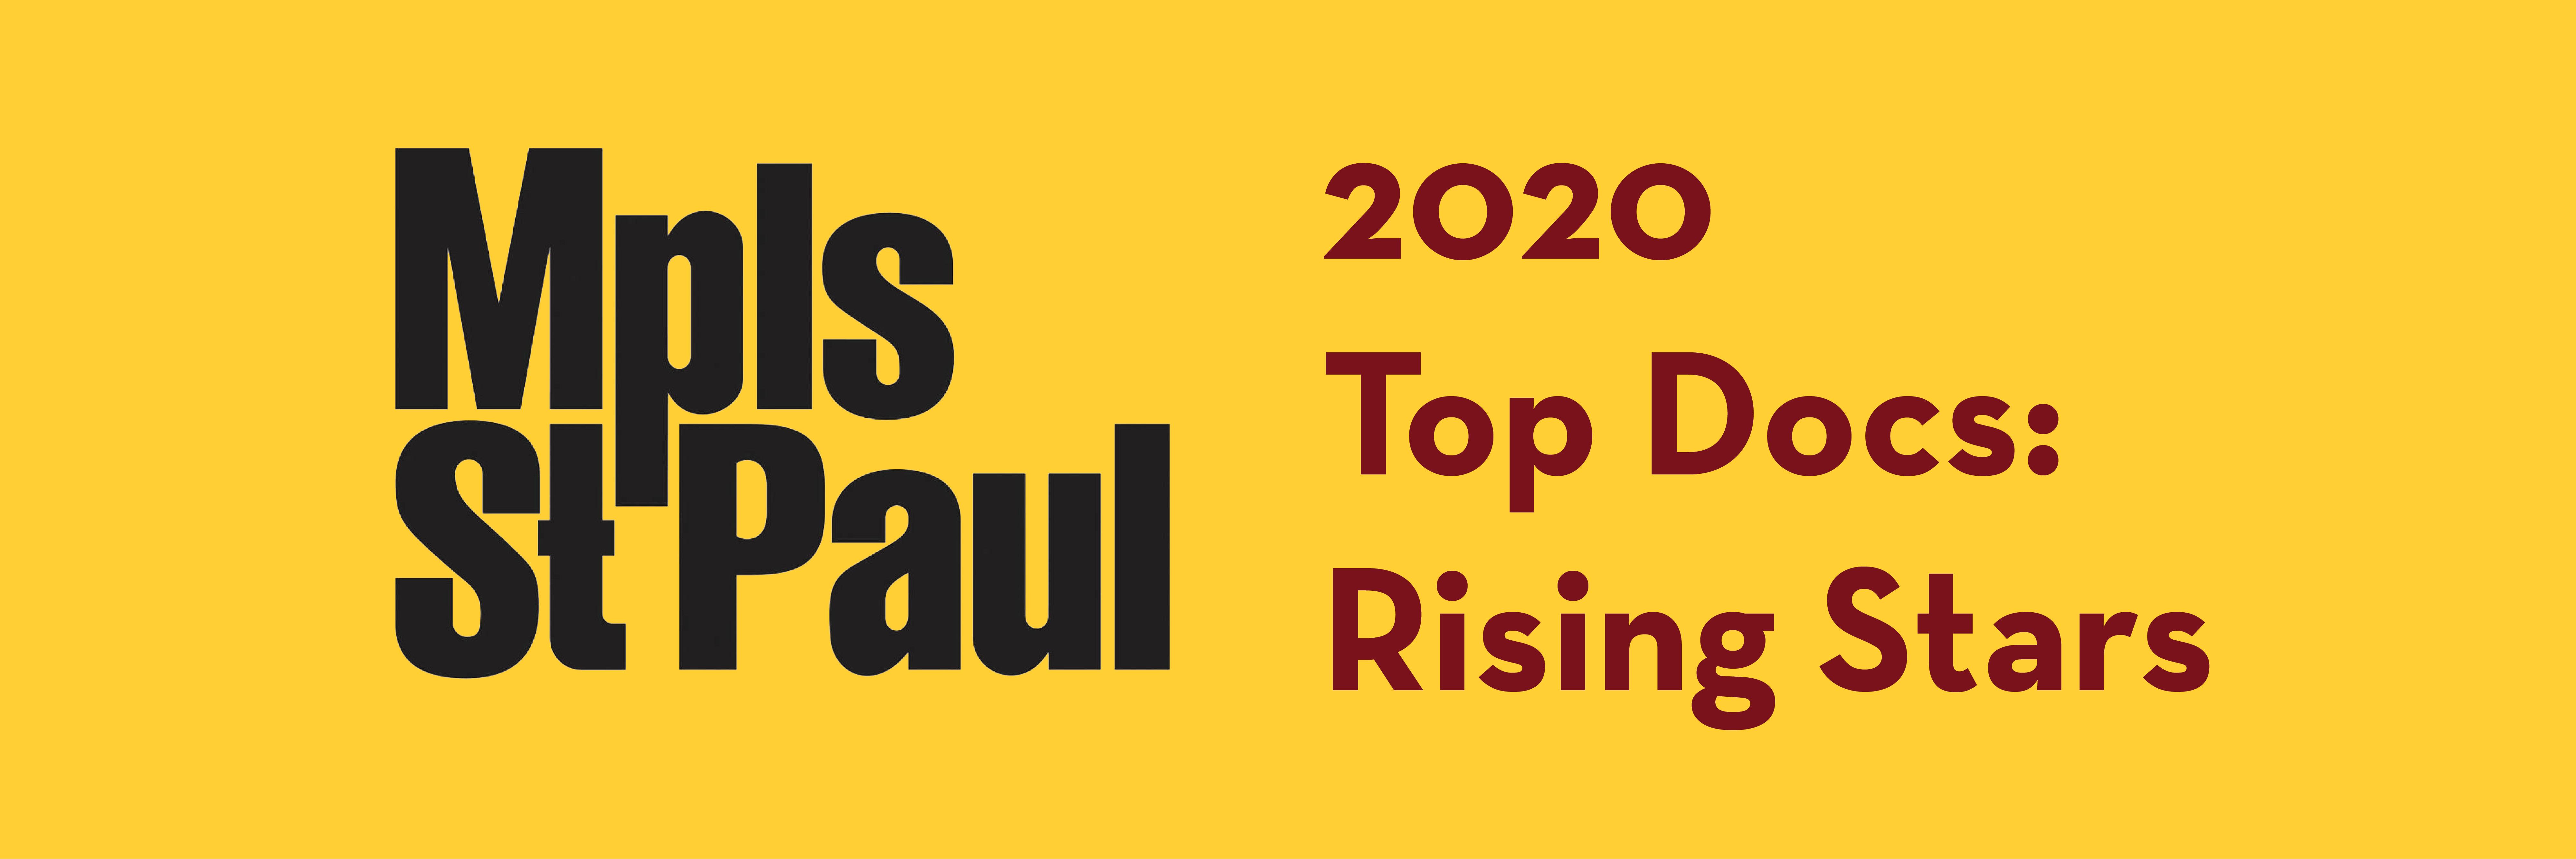 Top Docs Rising Stars